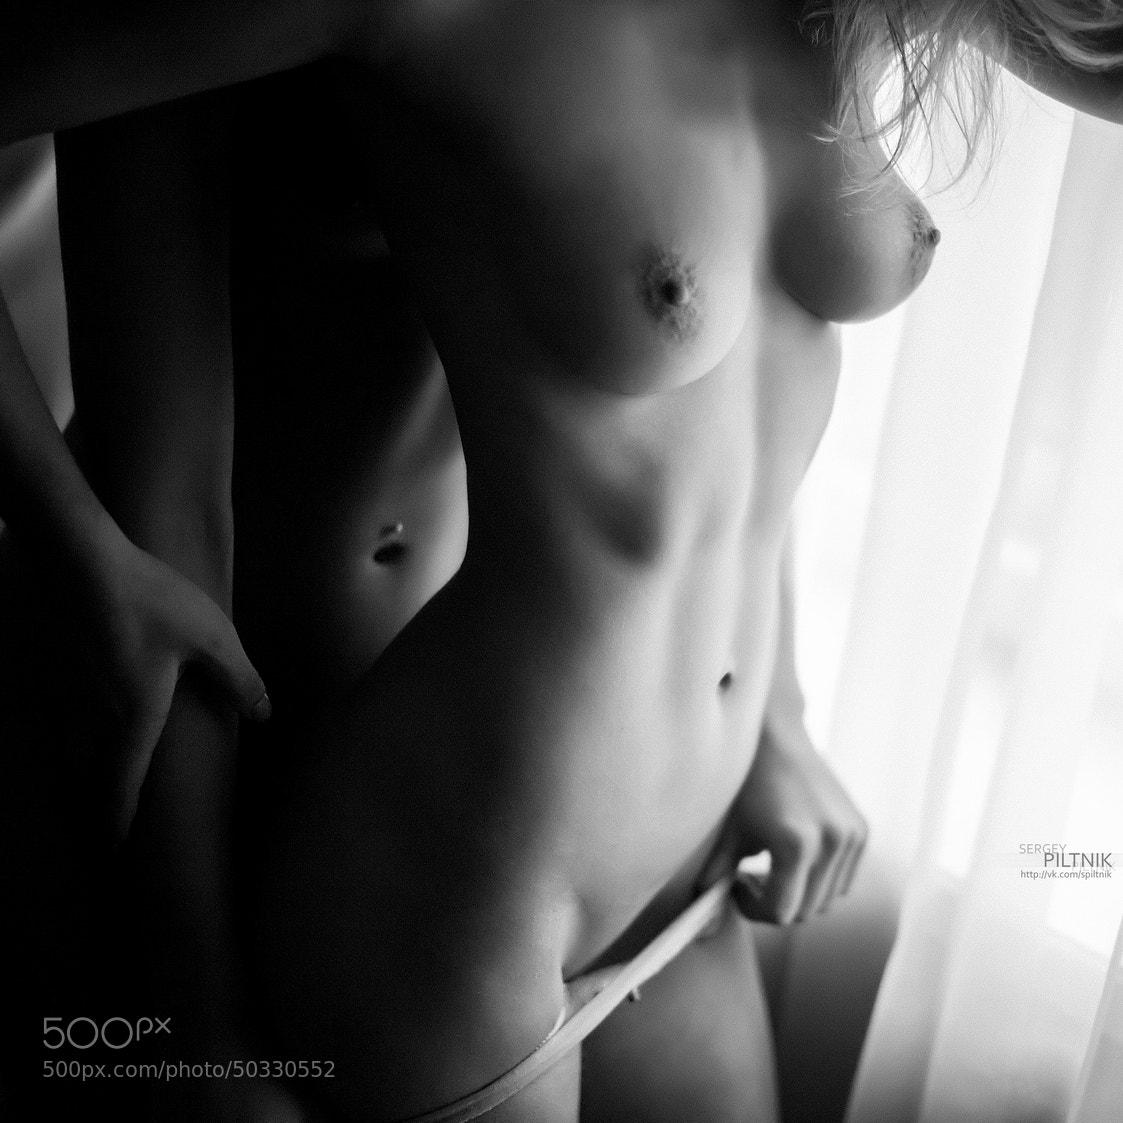 Photograph touches ...3 by Serg  Piltnik (Пилтник) on 500px